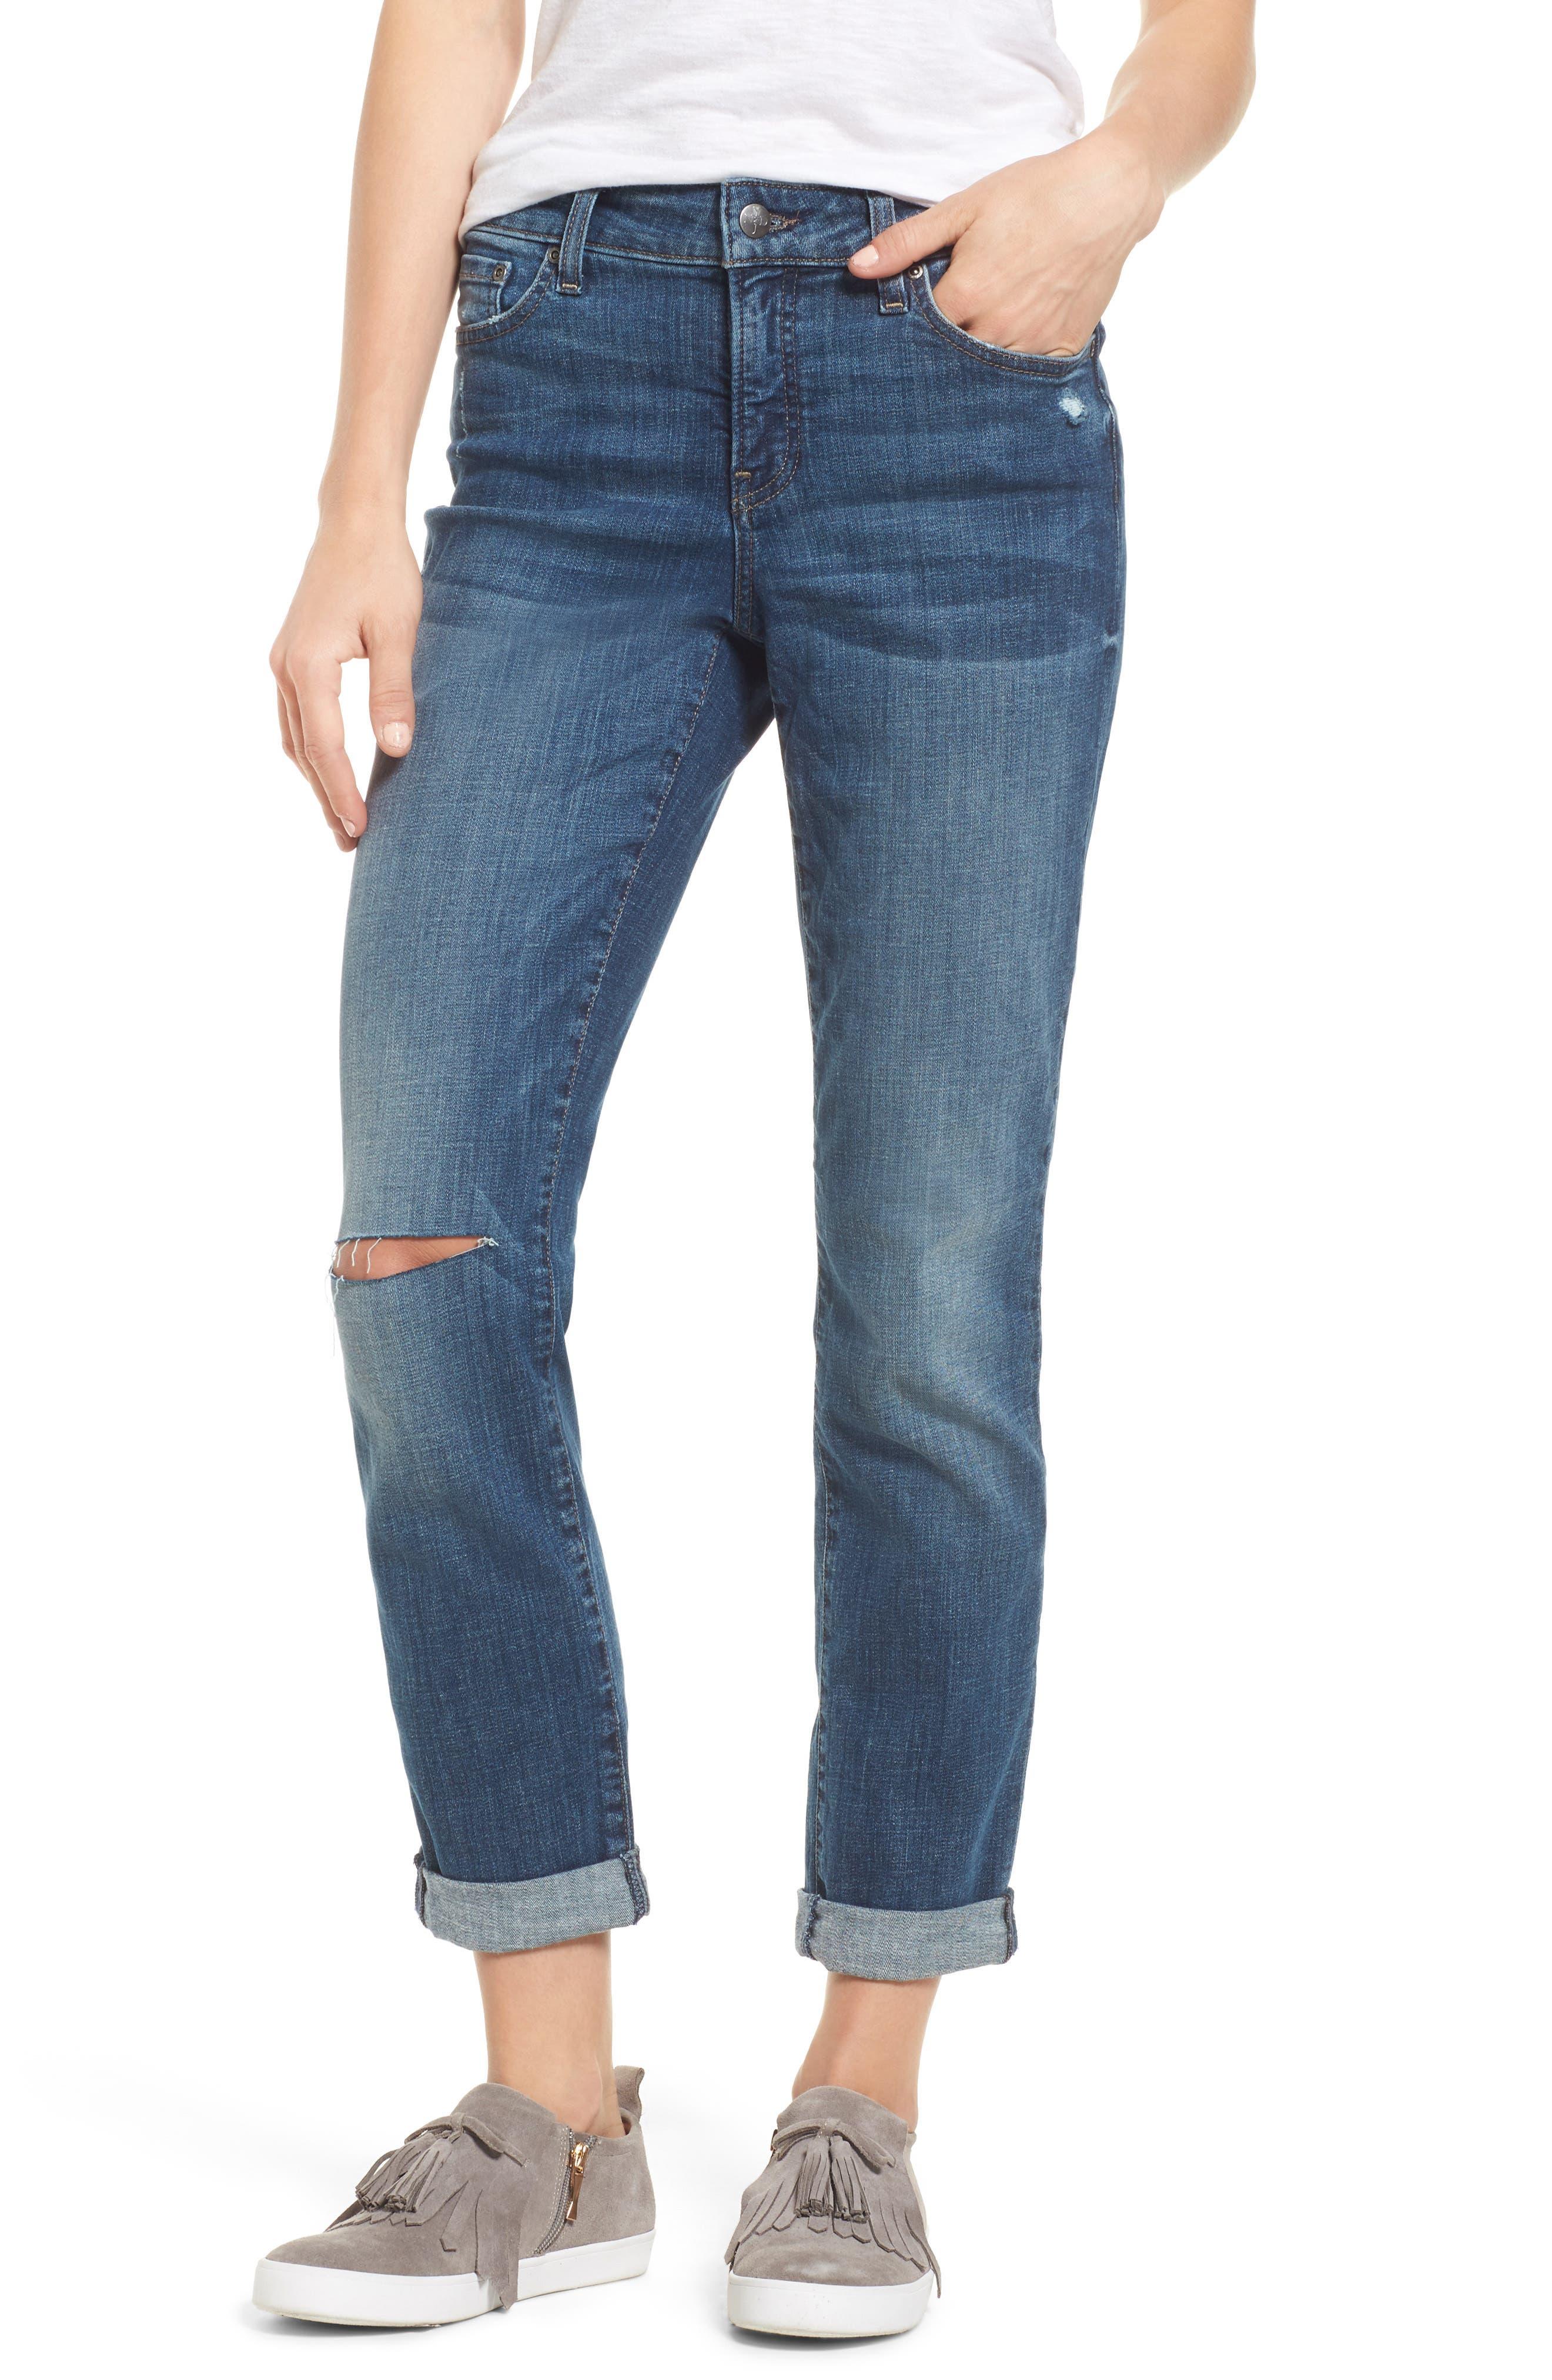 Alternate Image 1 Selected - NYDJ Stretch Boyfriend Jeans (Regular & Petite)